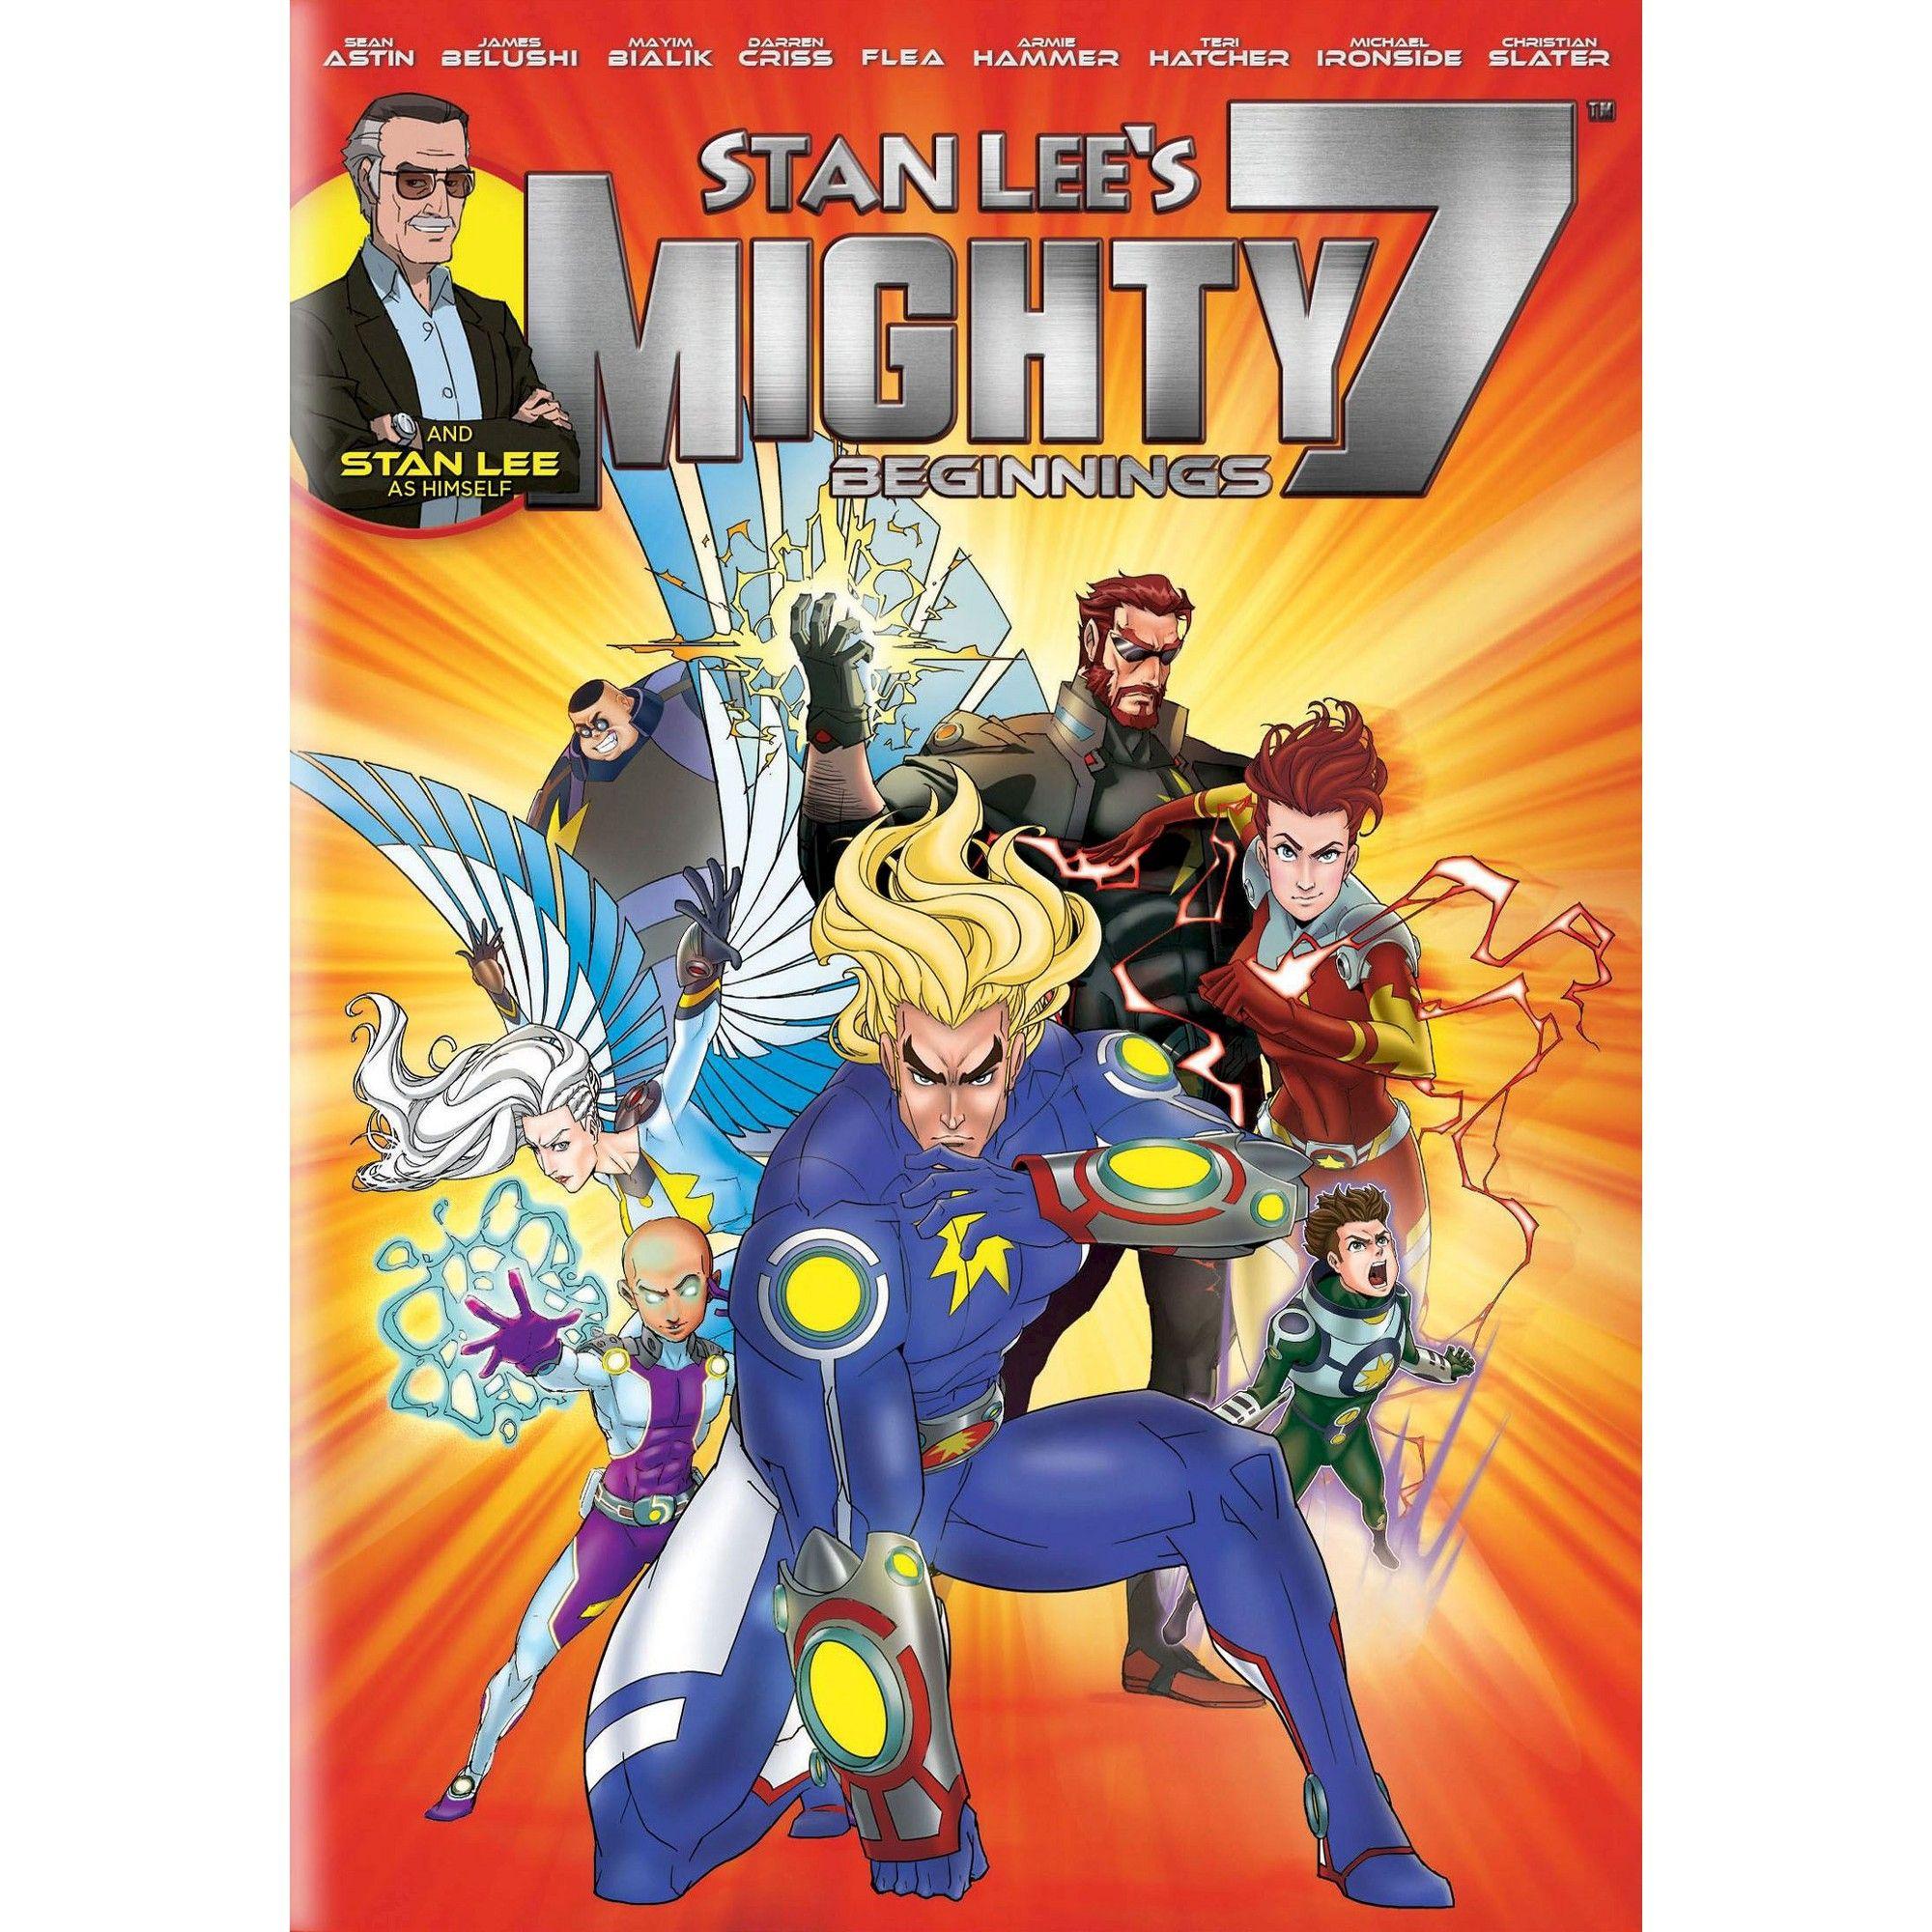 Stan Lee's Mighty 7 Beginnings (DVD) Animated cartoons